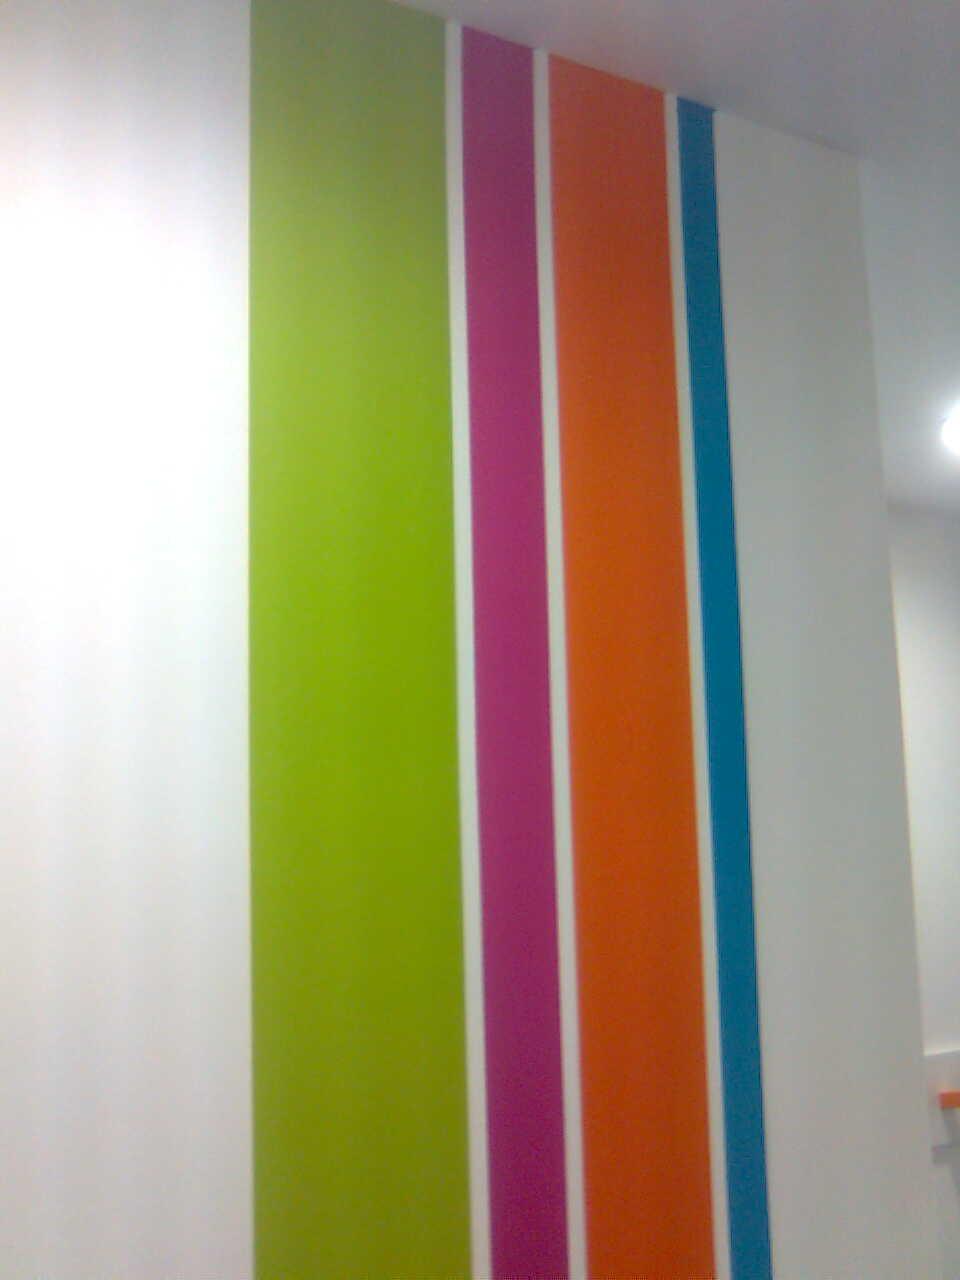 Grilo paint pintura decorativa listas decorativas - Pintura decorativa paredes ...